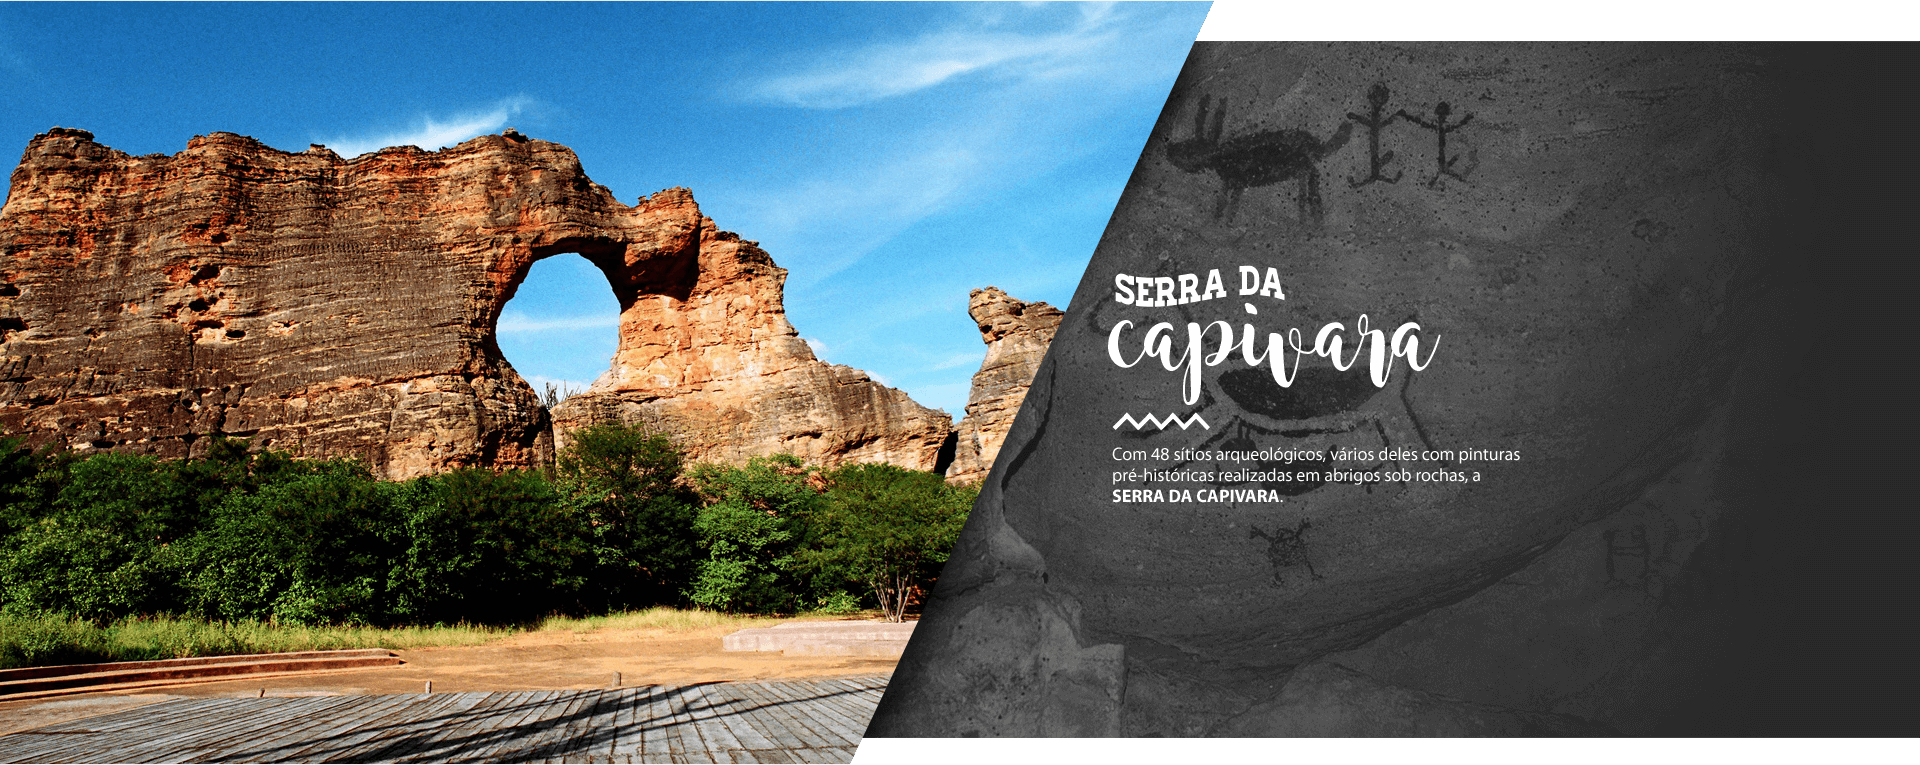 Pacote Serra da Capivara